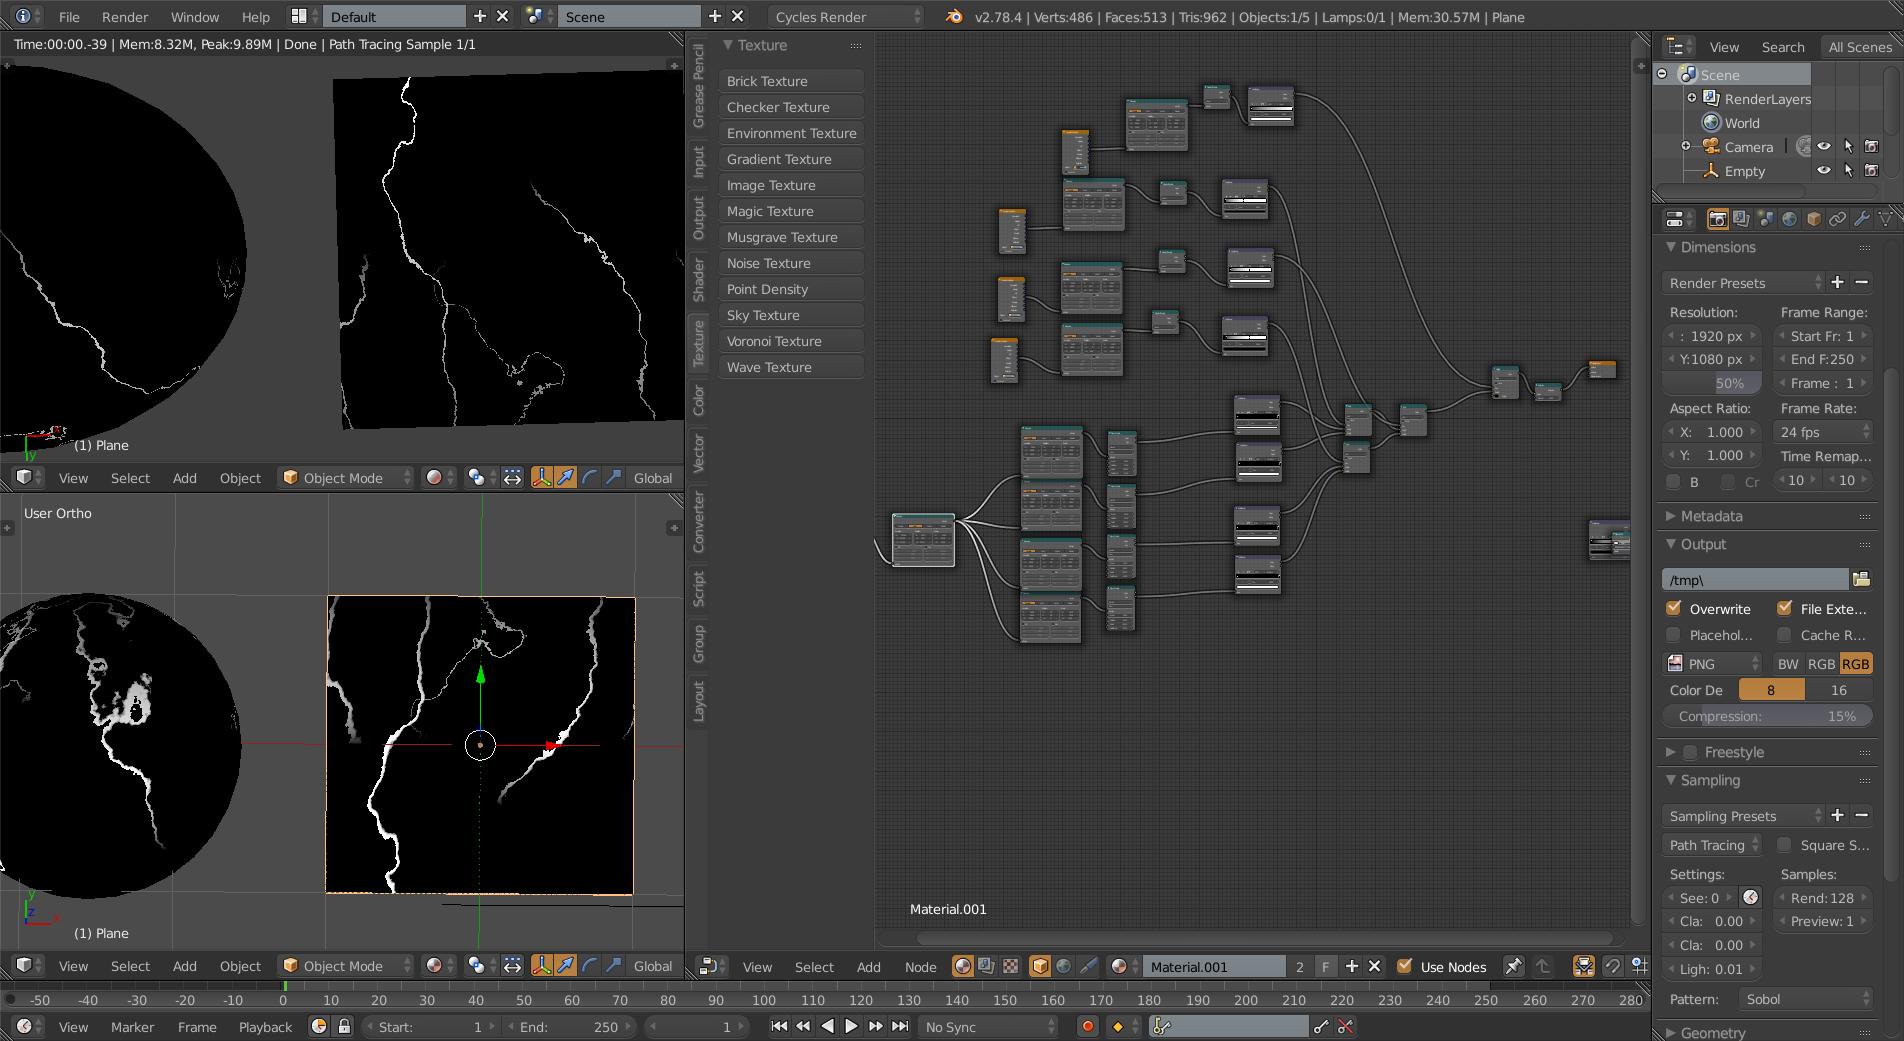 creating procedural cracks - Materials and Textures